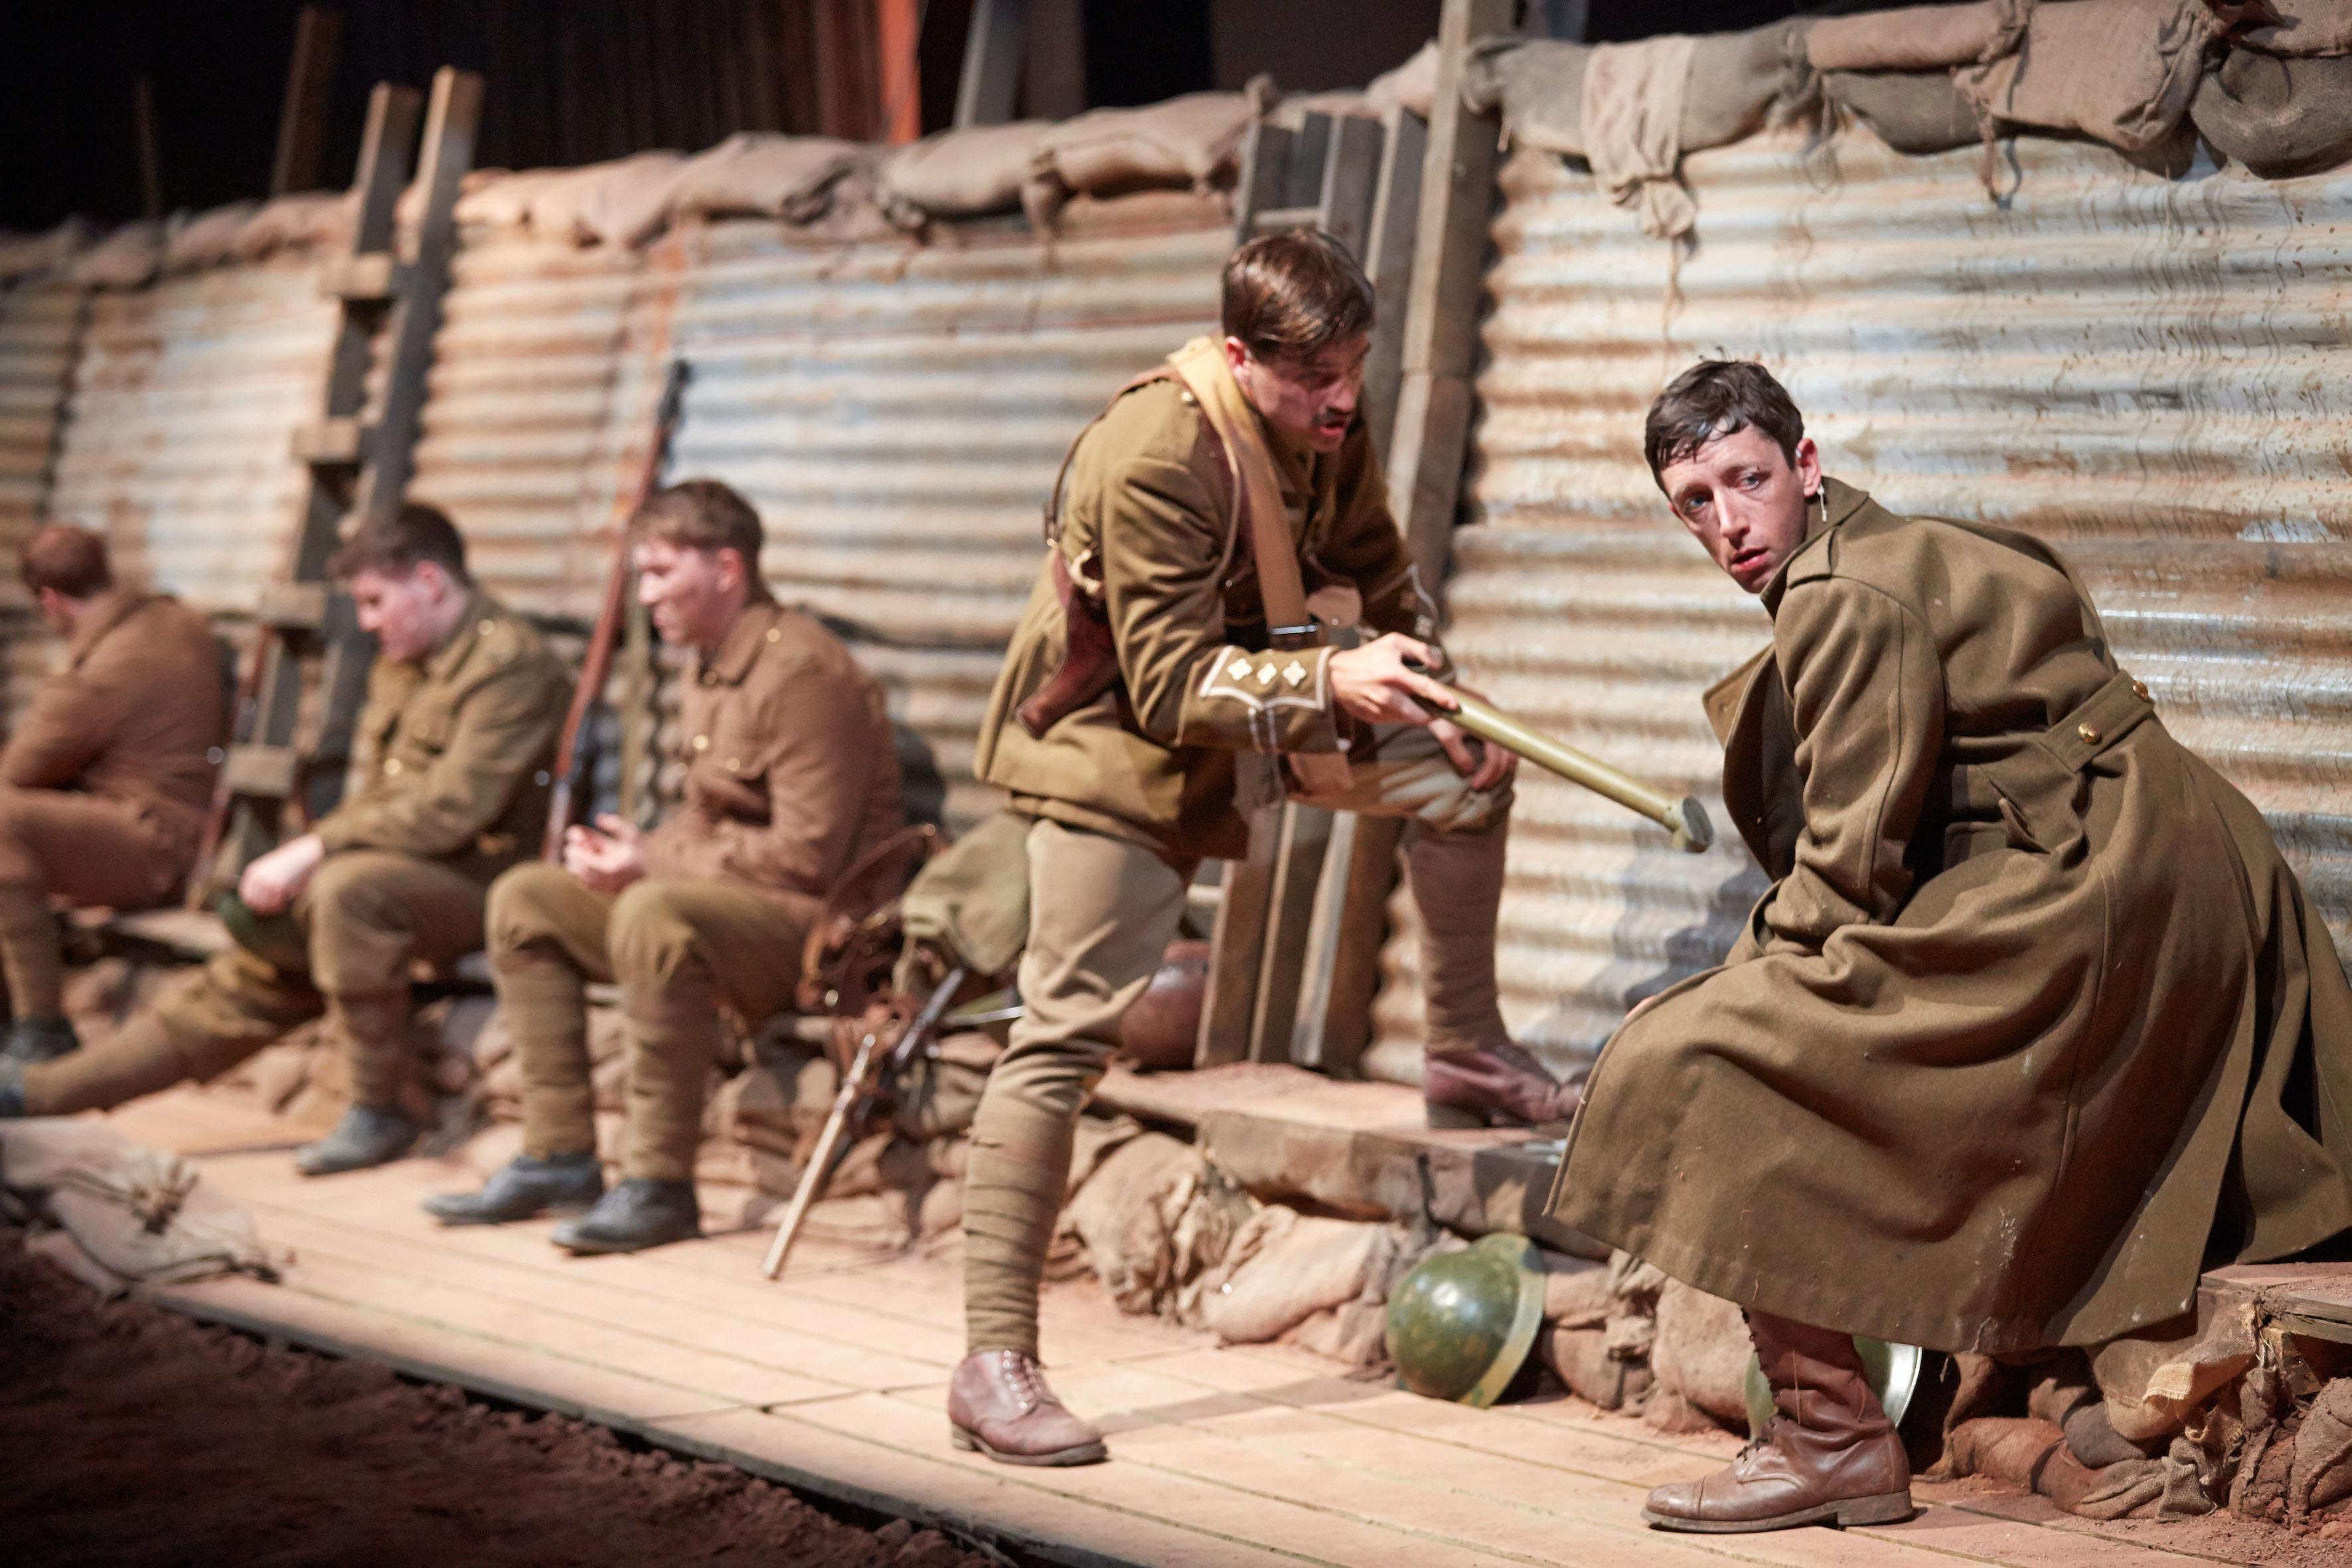 Mametz, National Theatre Wales. Image credit - Mark Douet